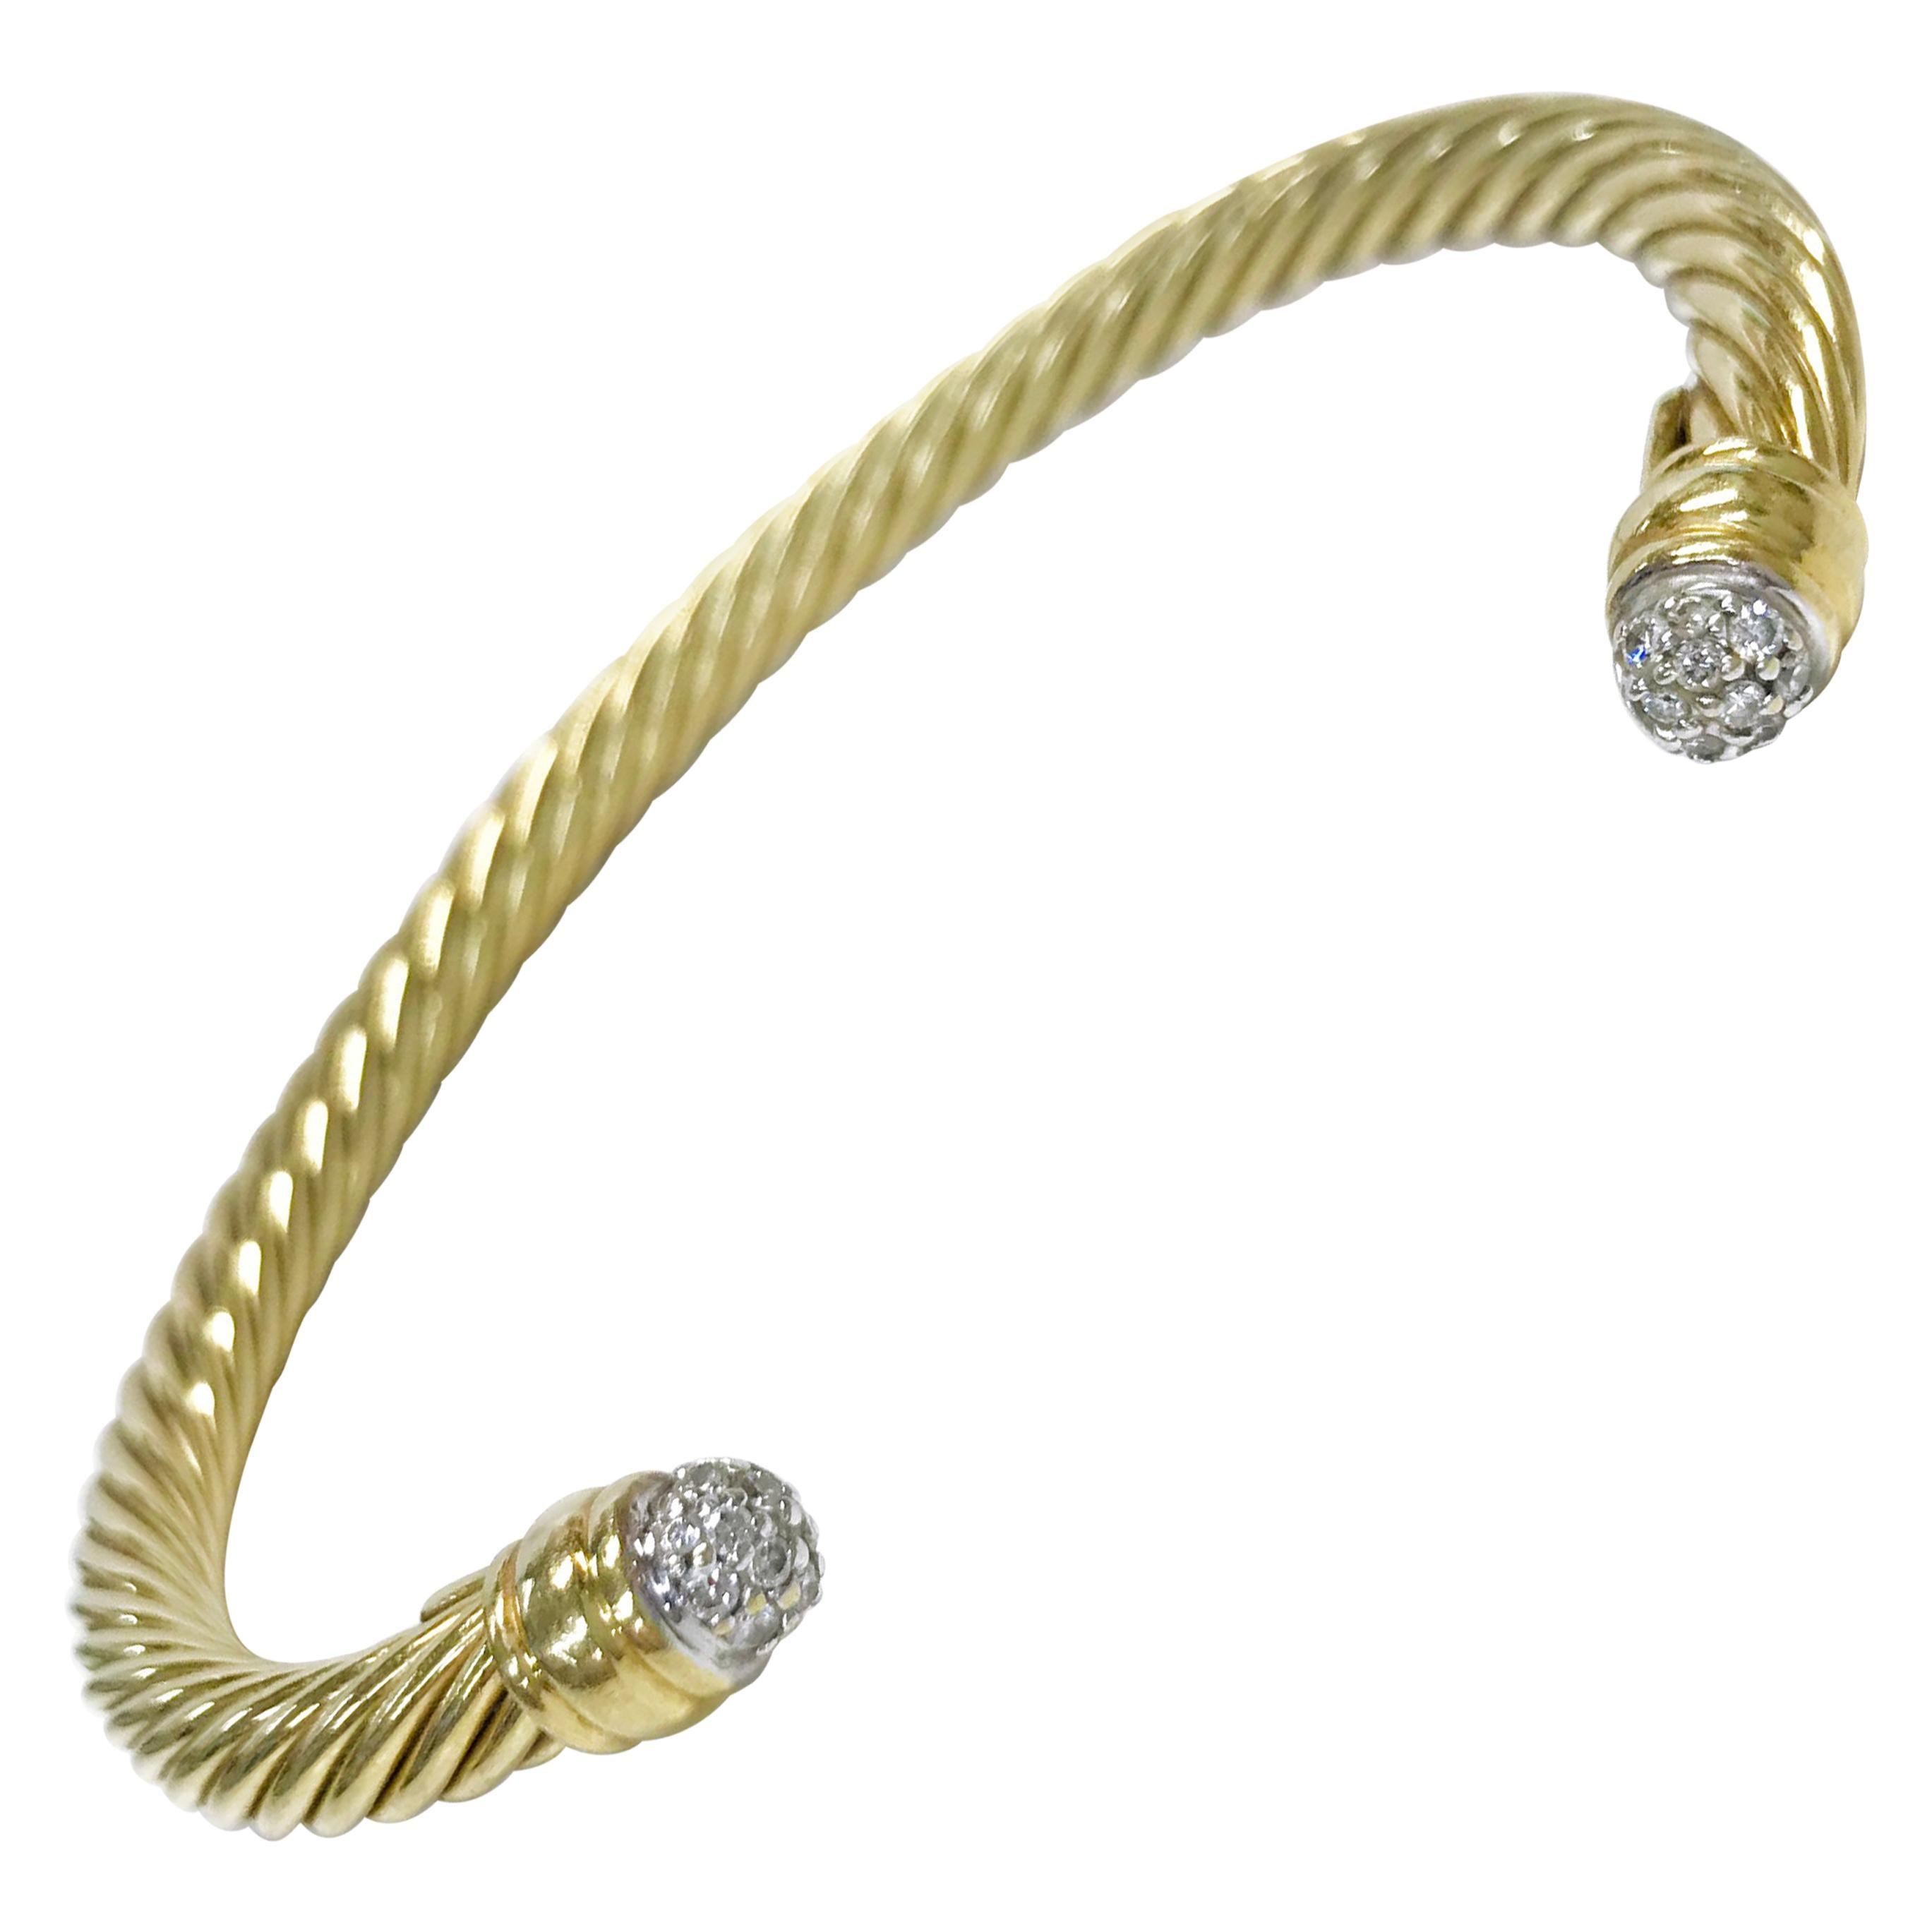 18 Karat David Yurman Diamond Pave Spira Cable Cuff Bracelet